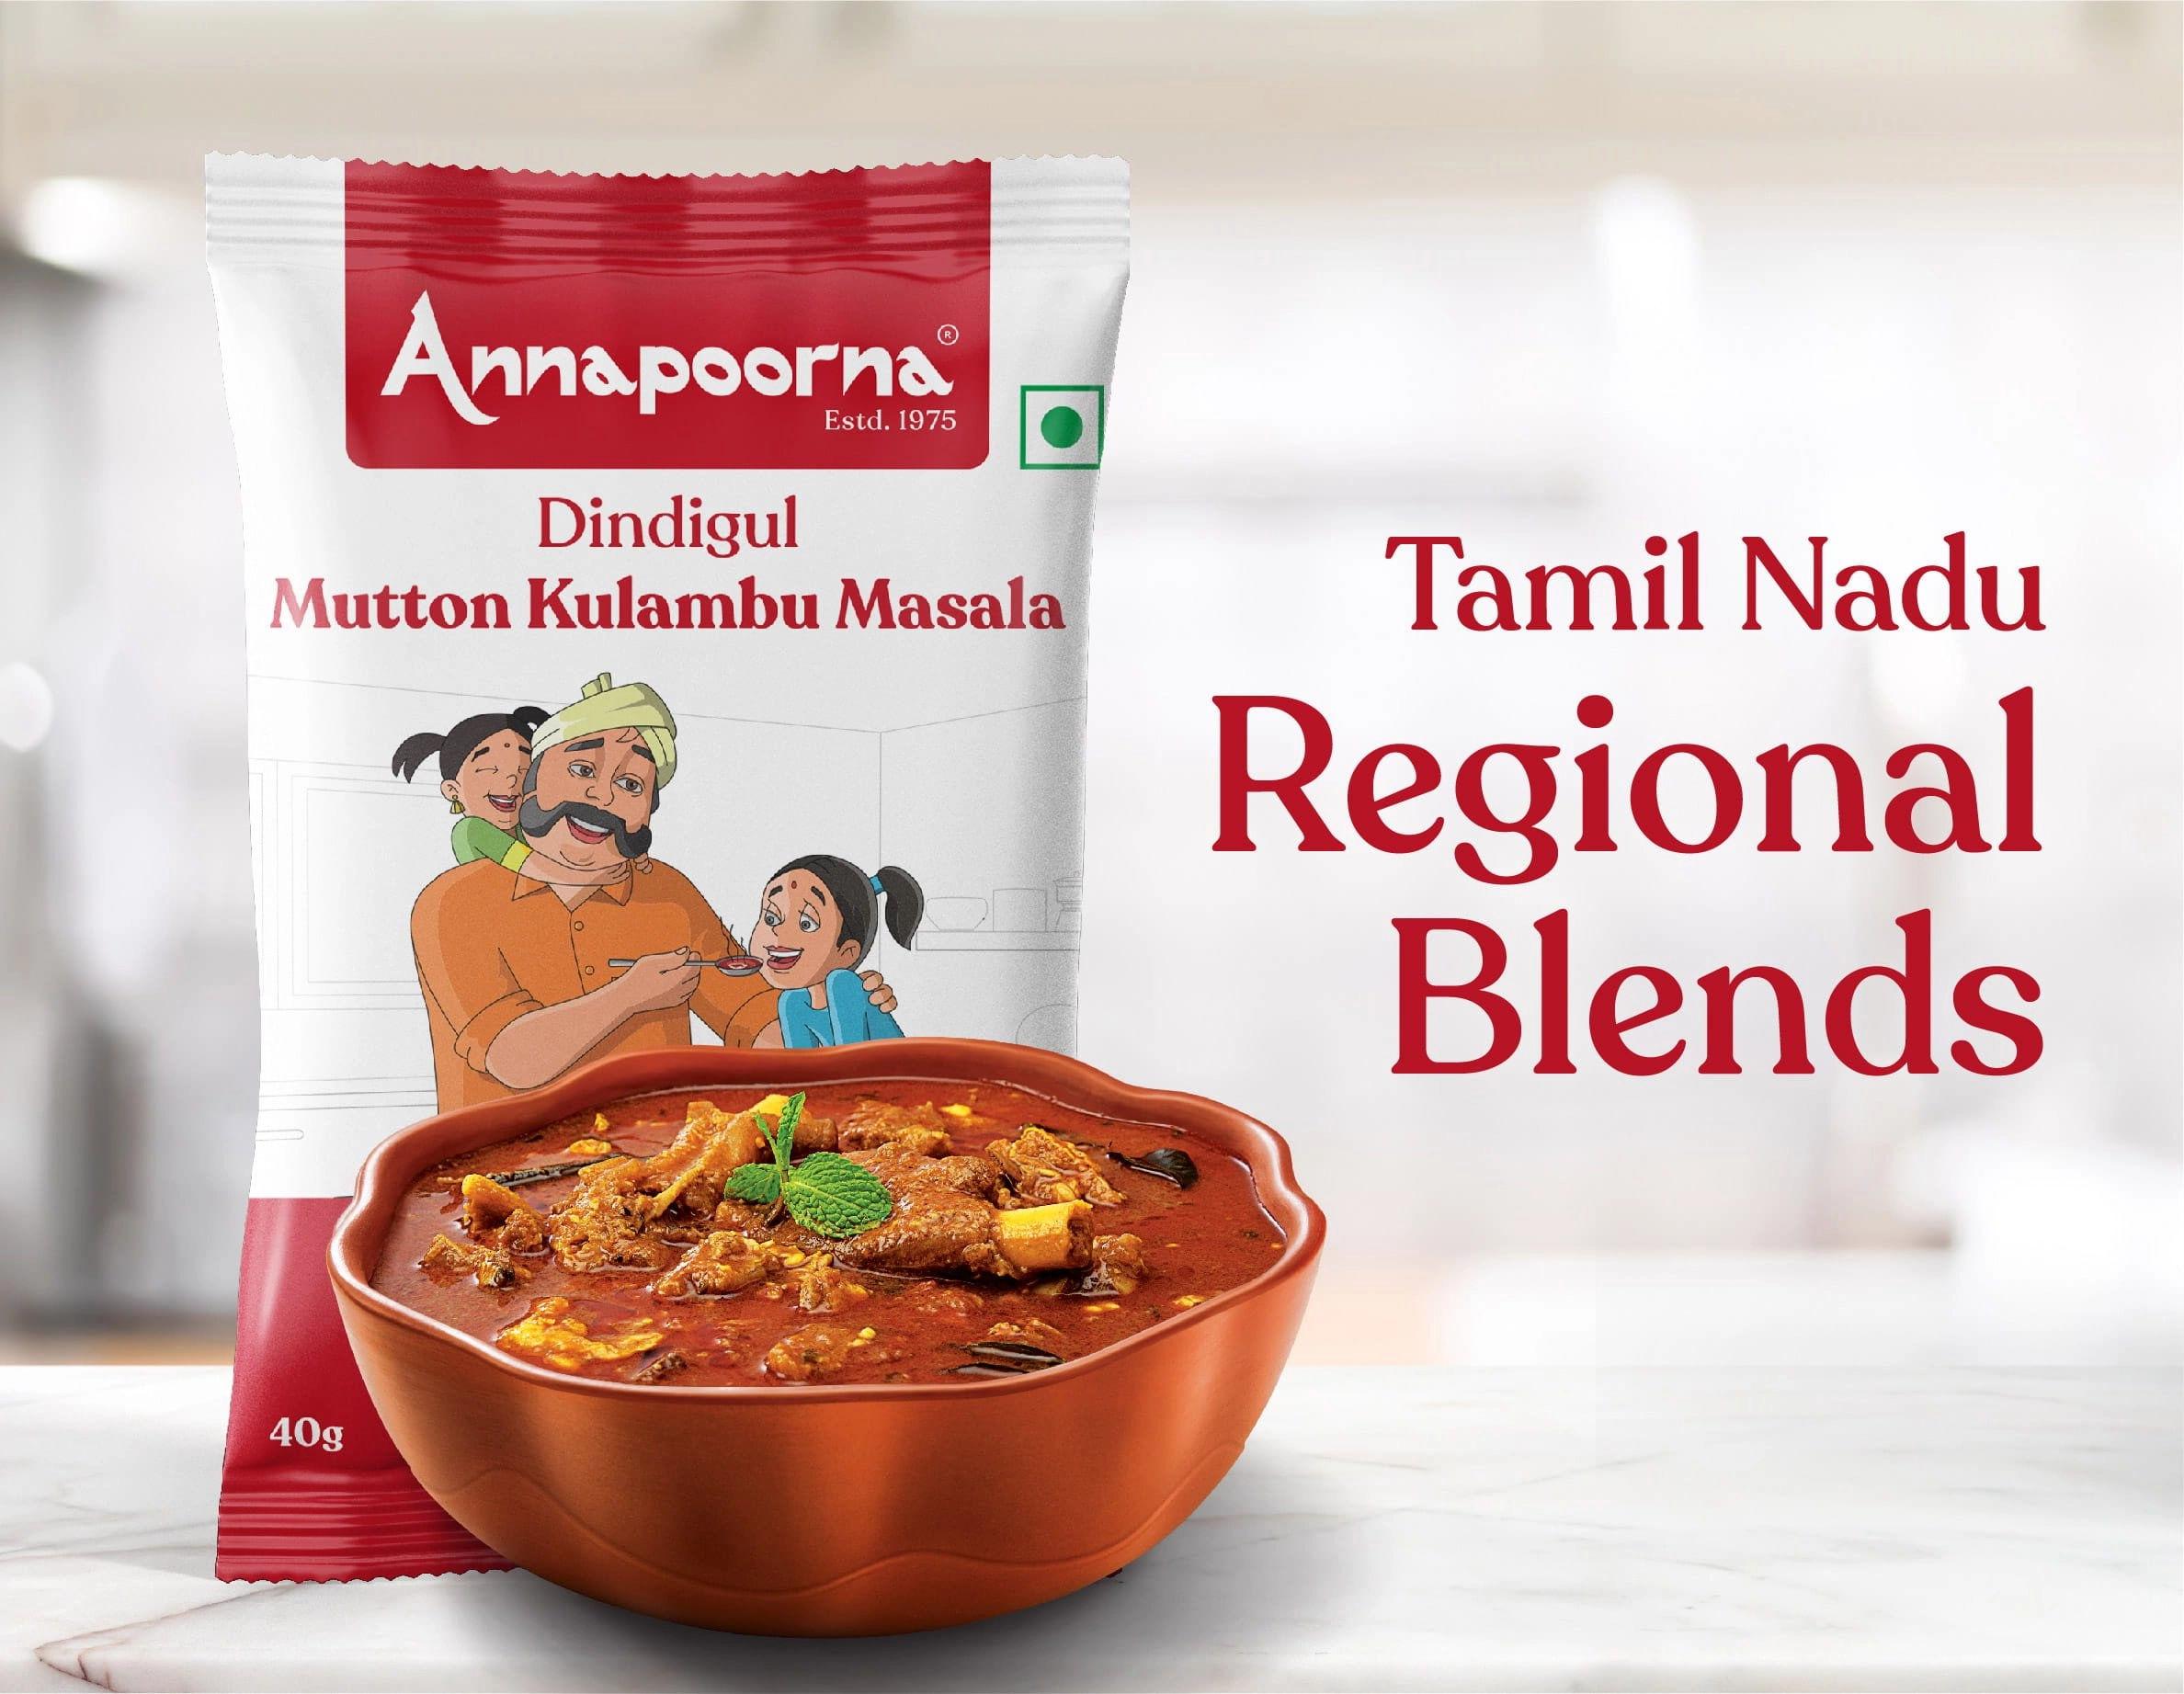 Tamilnadu Regional Blends